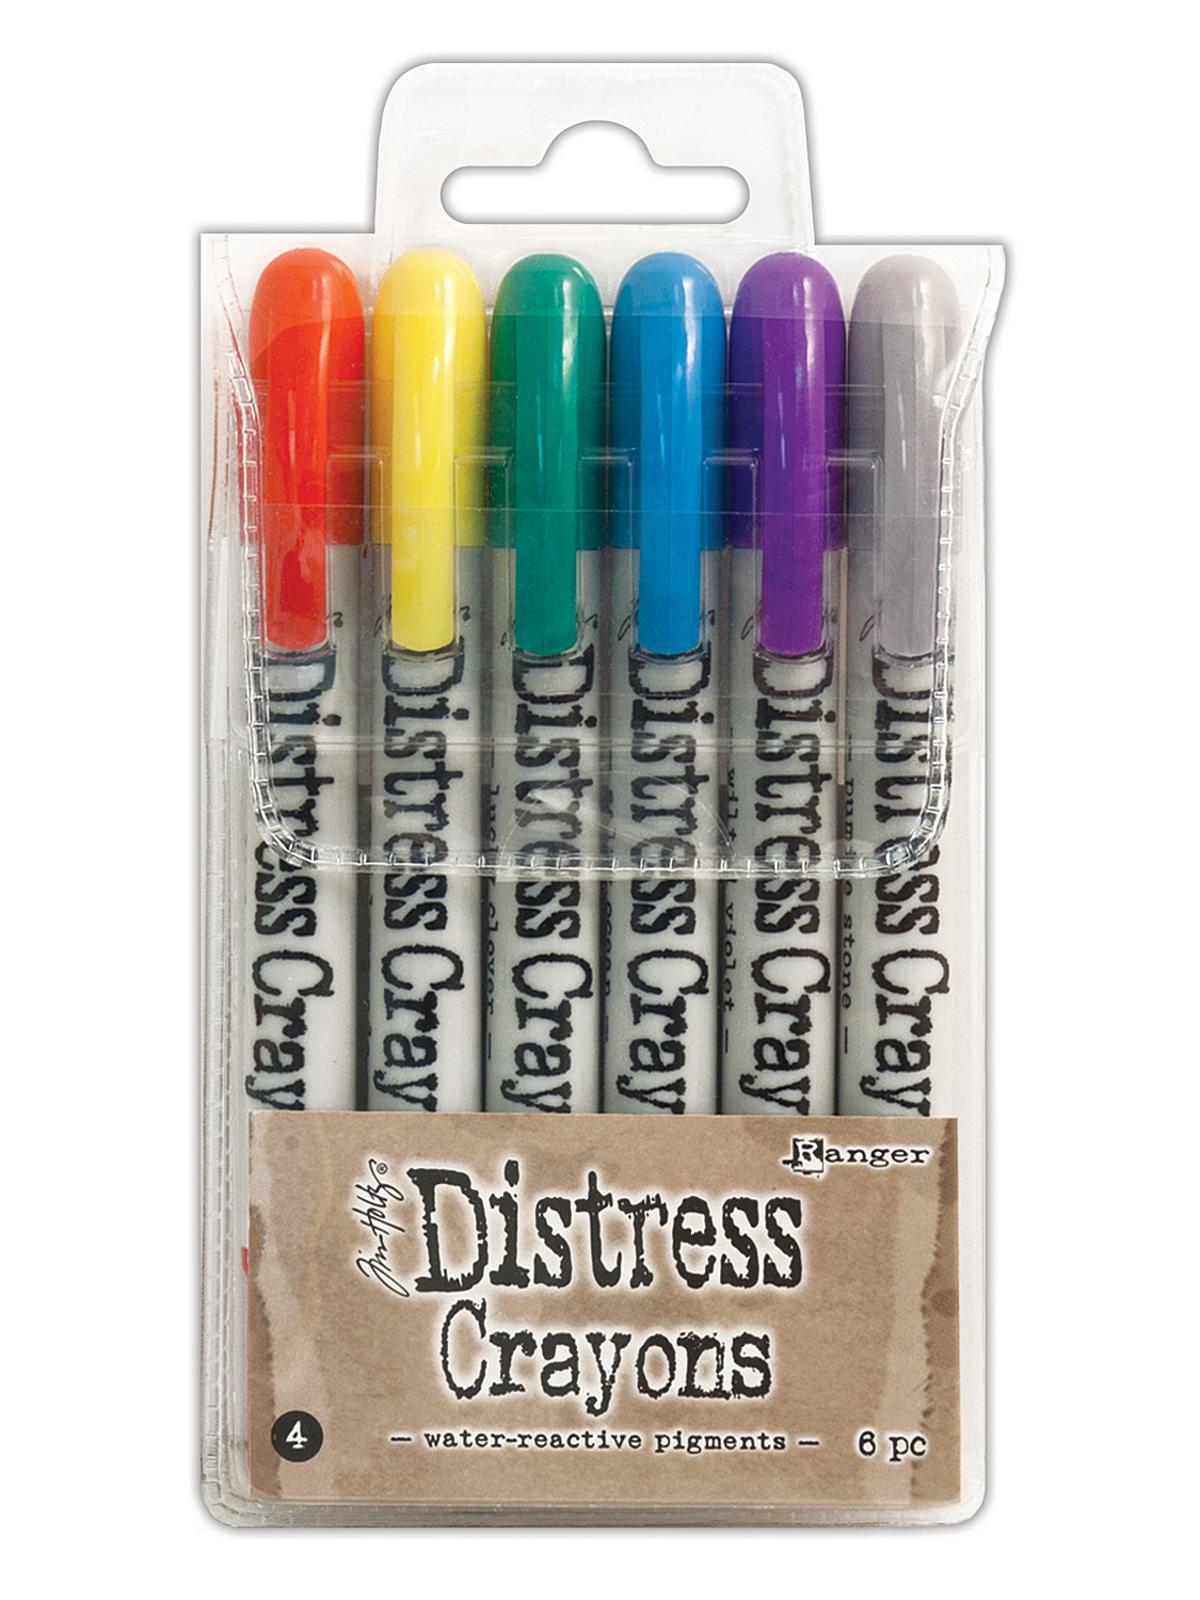 Tim Holtz Distress Crayons Set of 6 #4 /& 5 NEW Lot of 12 Colors Total Bundle